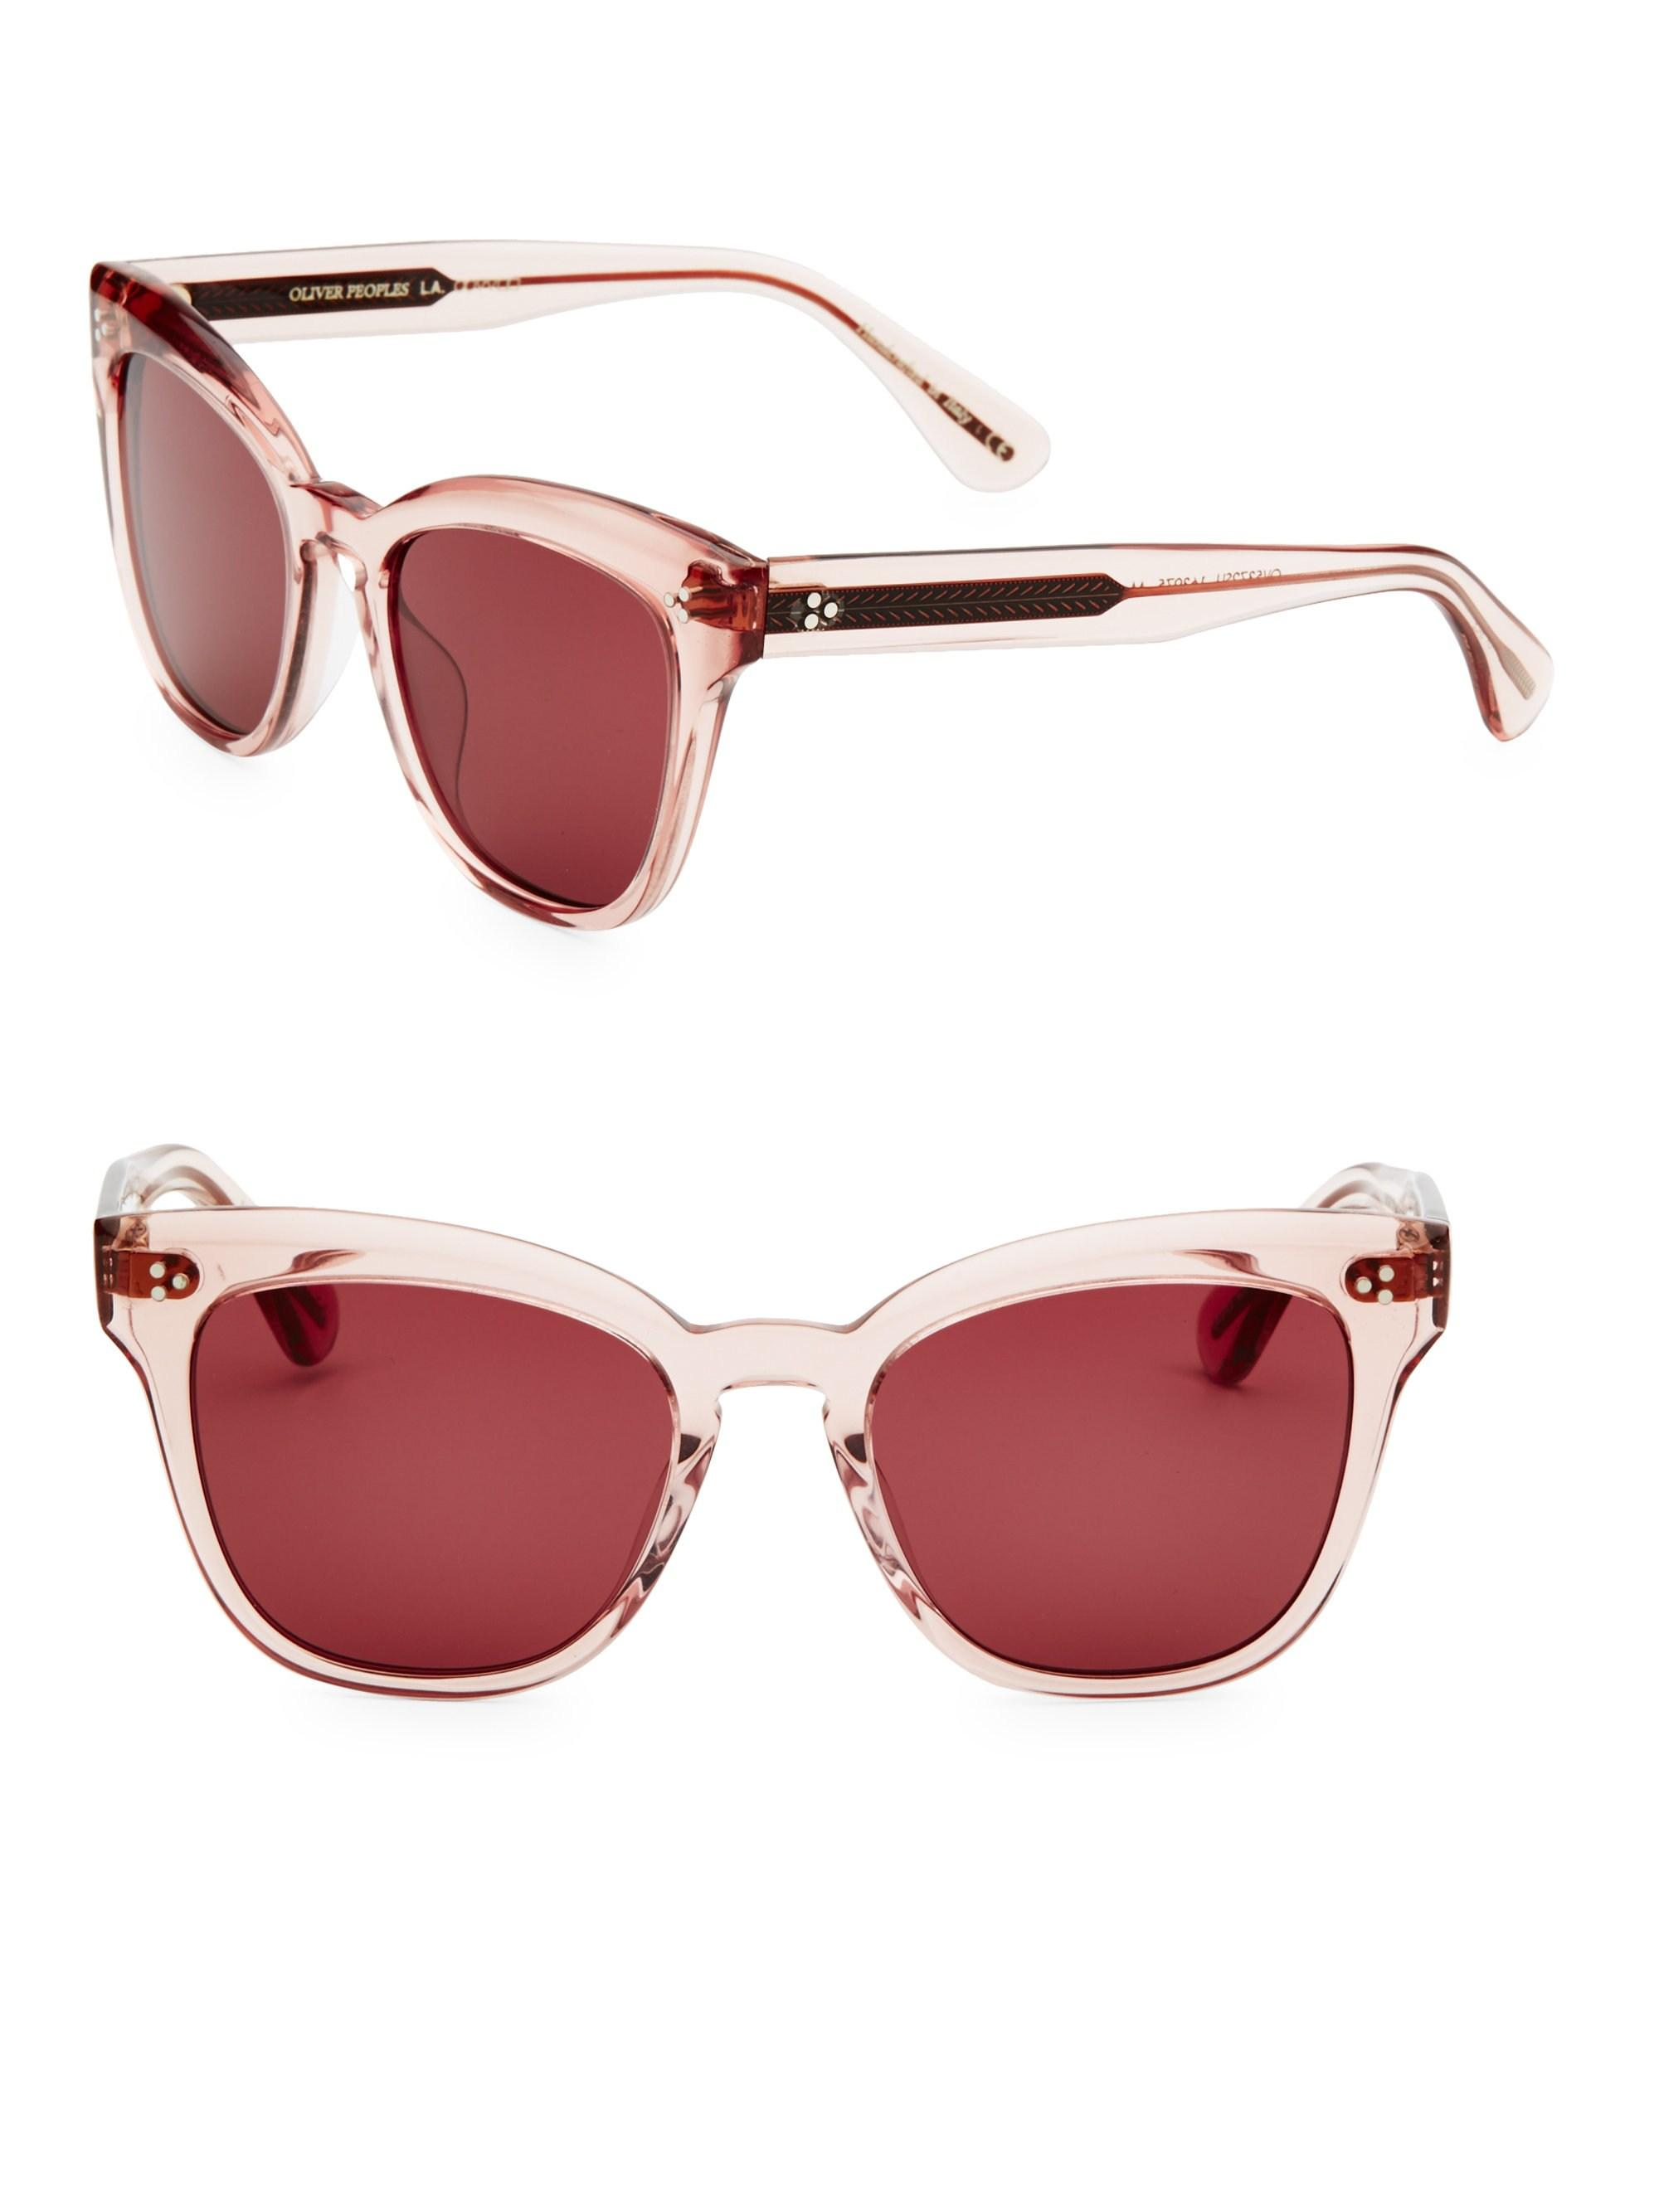 160b665b3b Oliver Peoples Marianela 54mm Cat-eye Sunglasses in Pink - Lyst